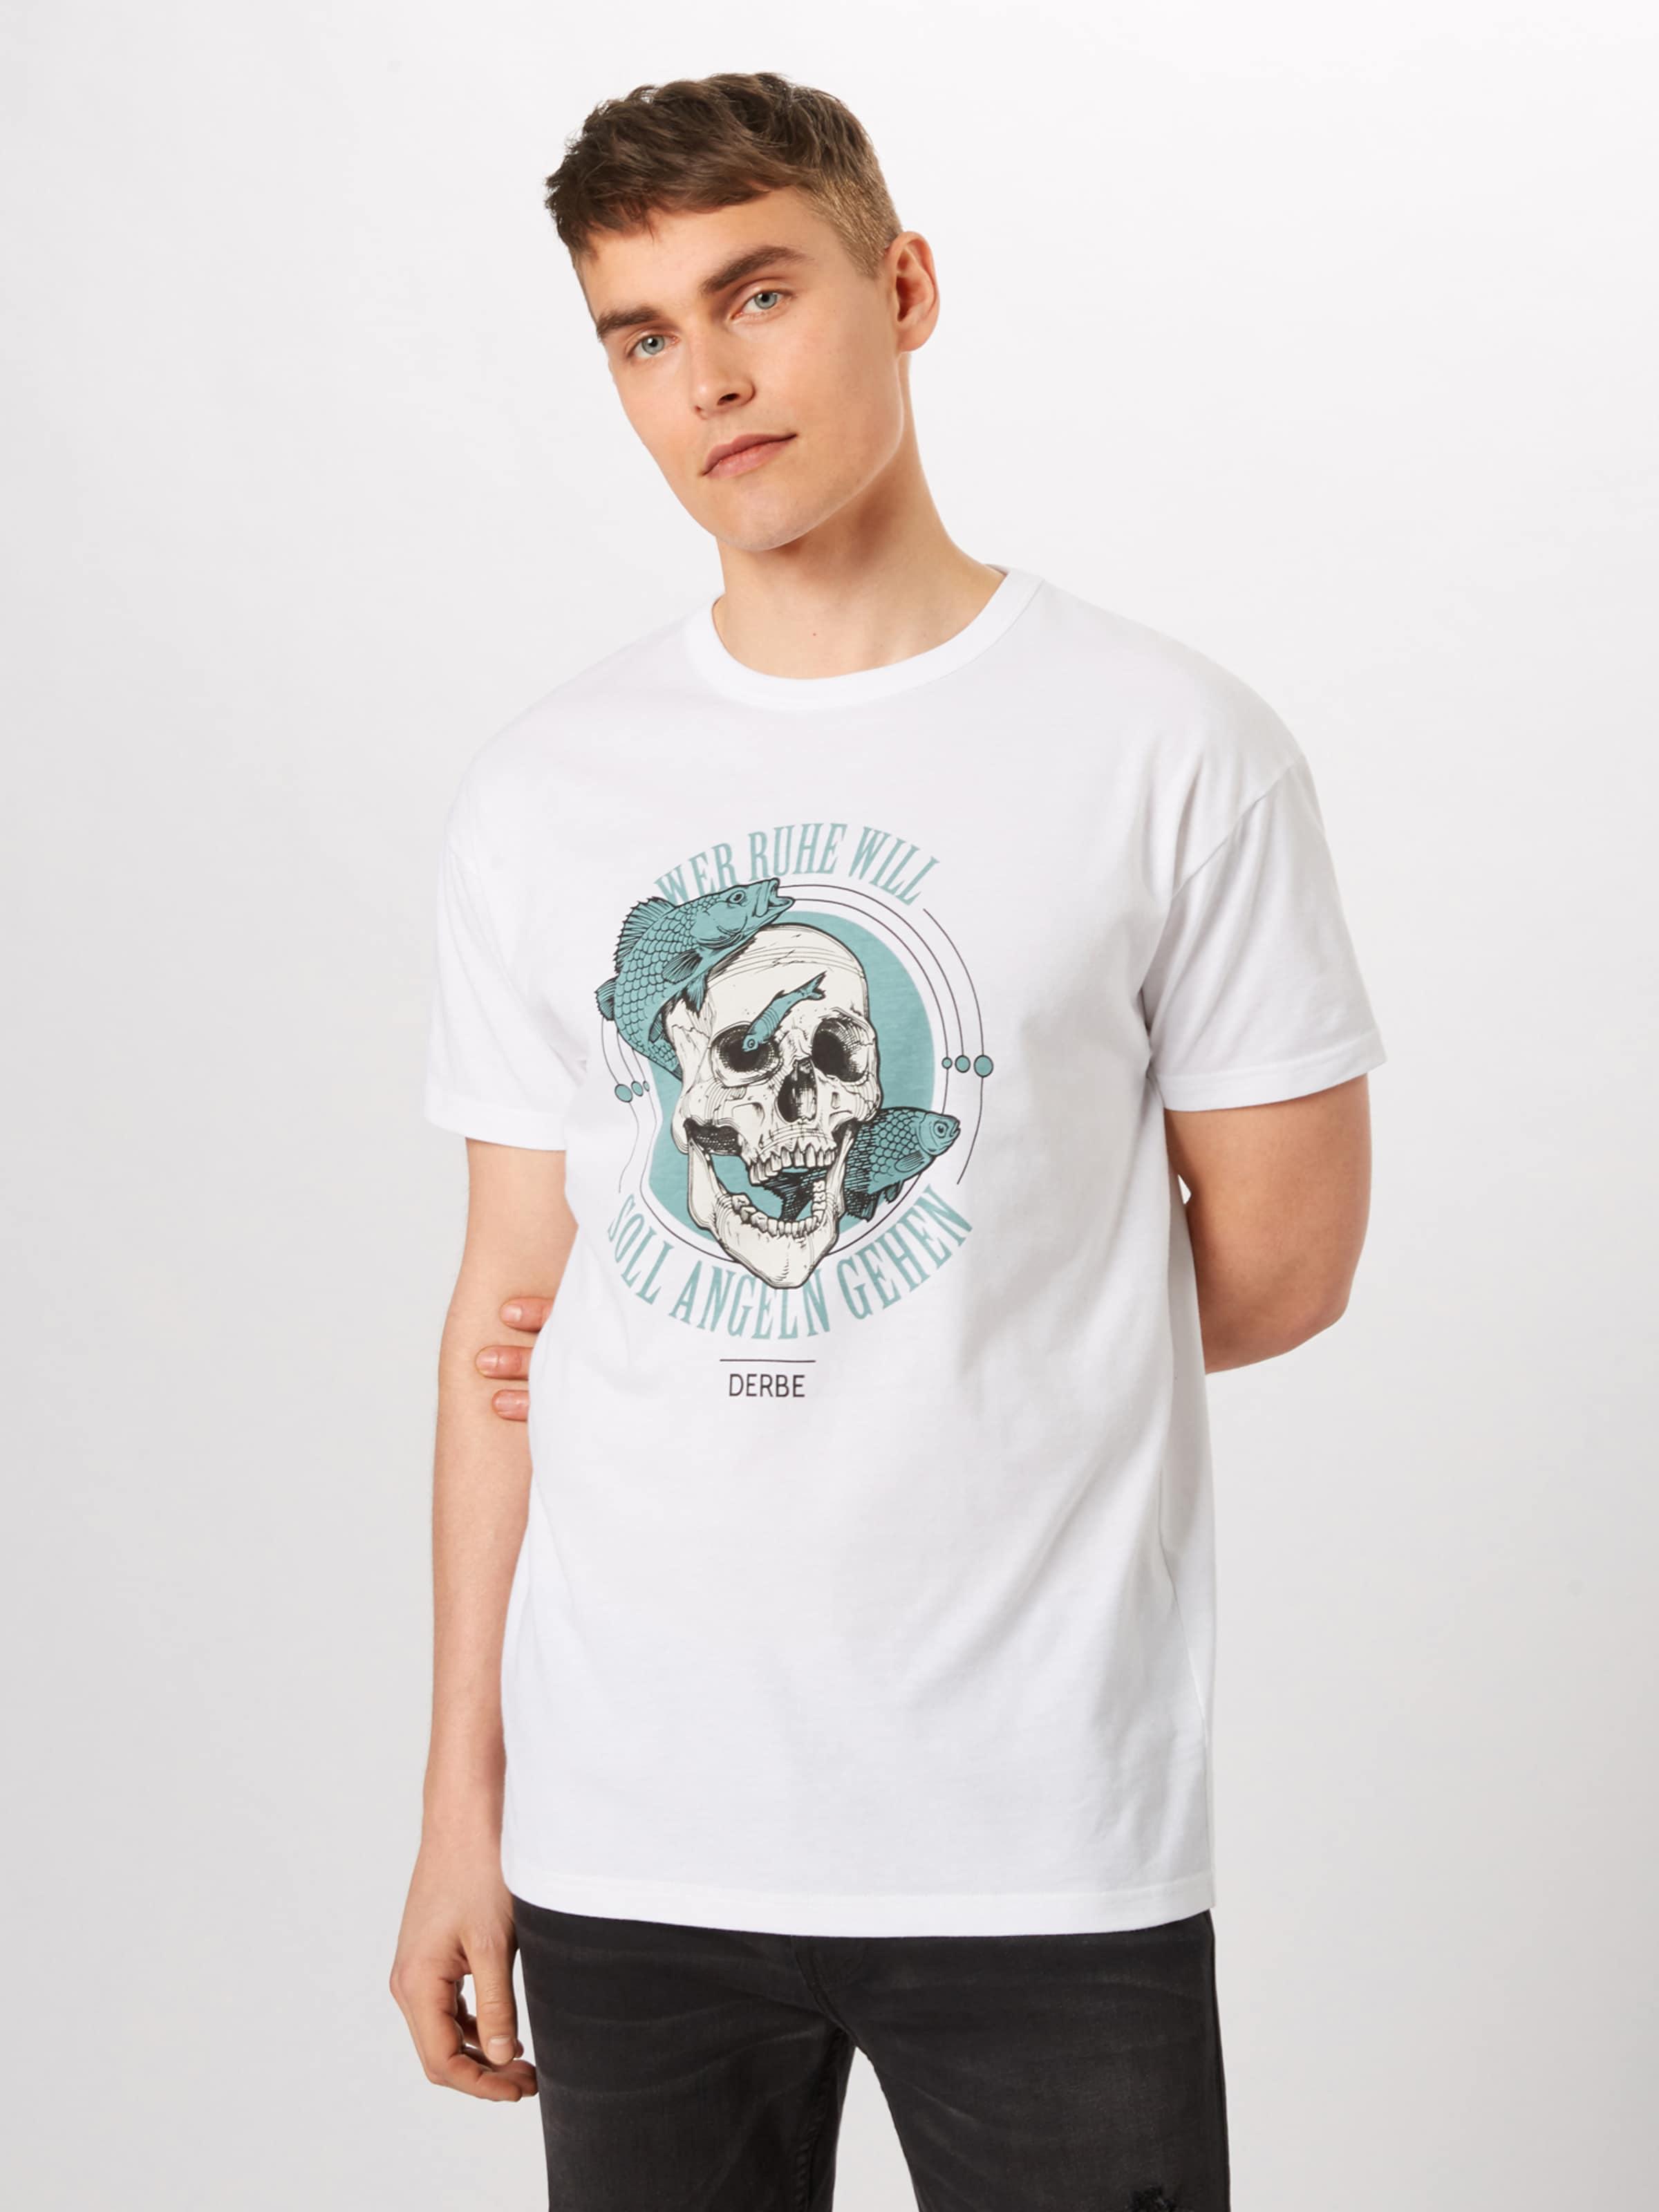 ClairBlanc En Derbe shirt T Bleu 'angeln' l13KuFJTc